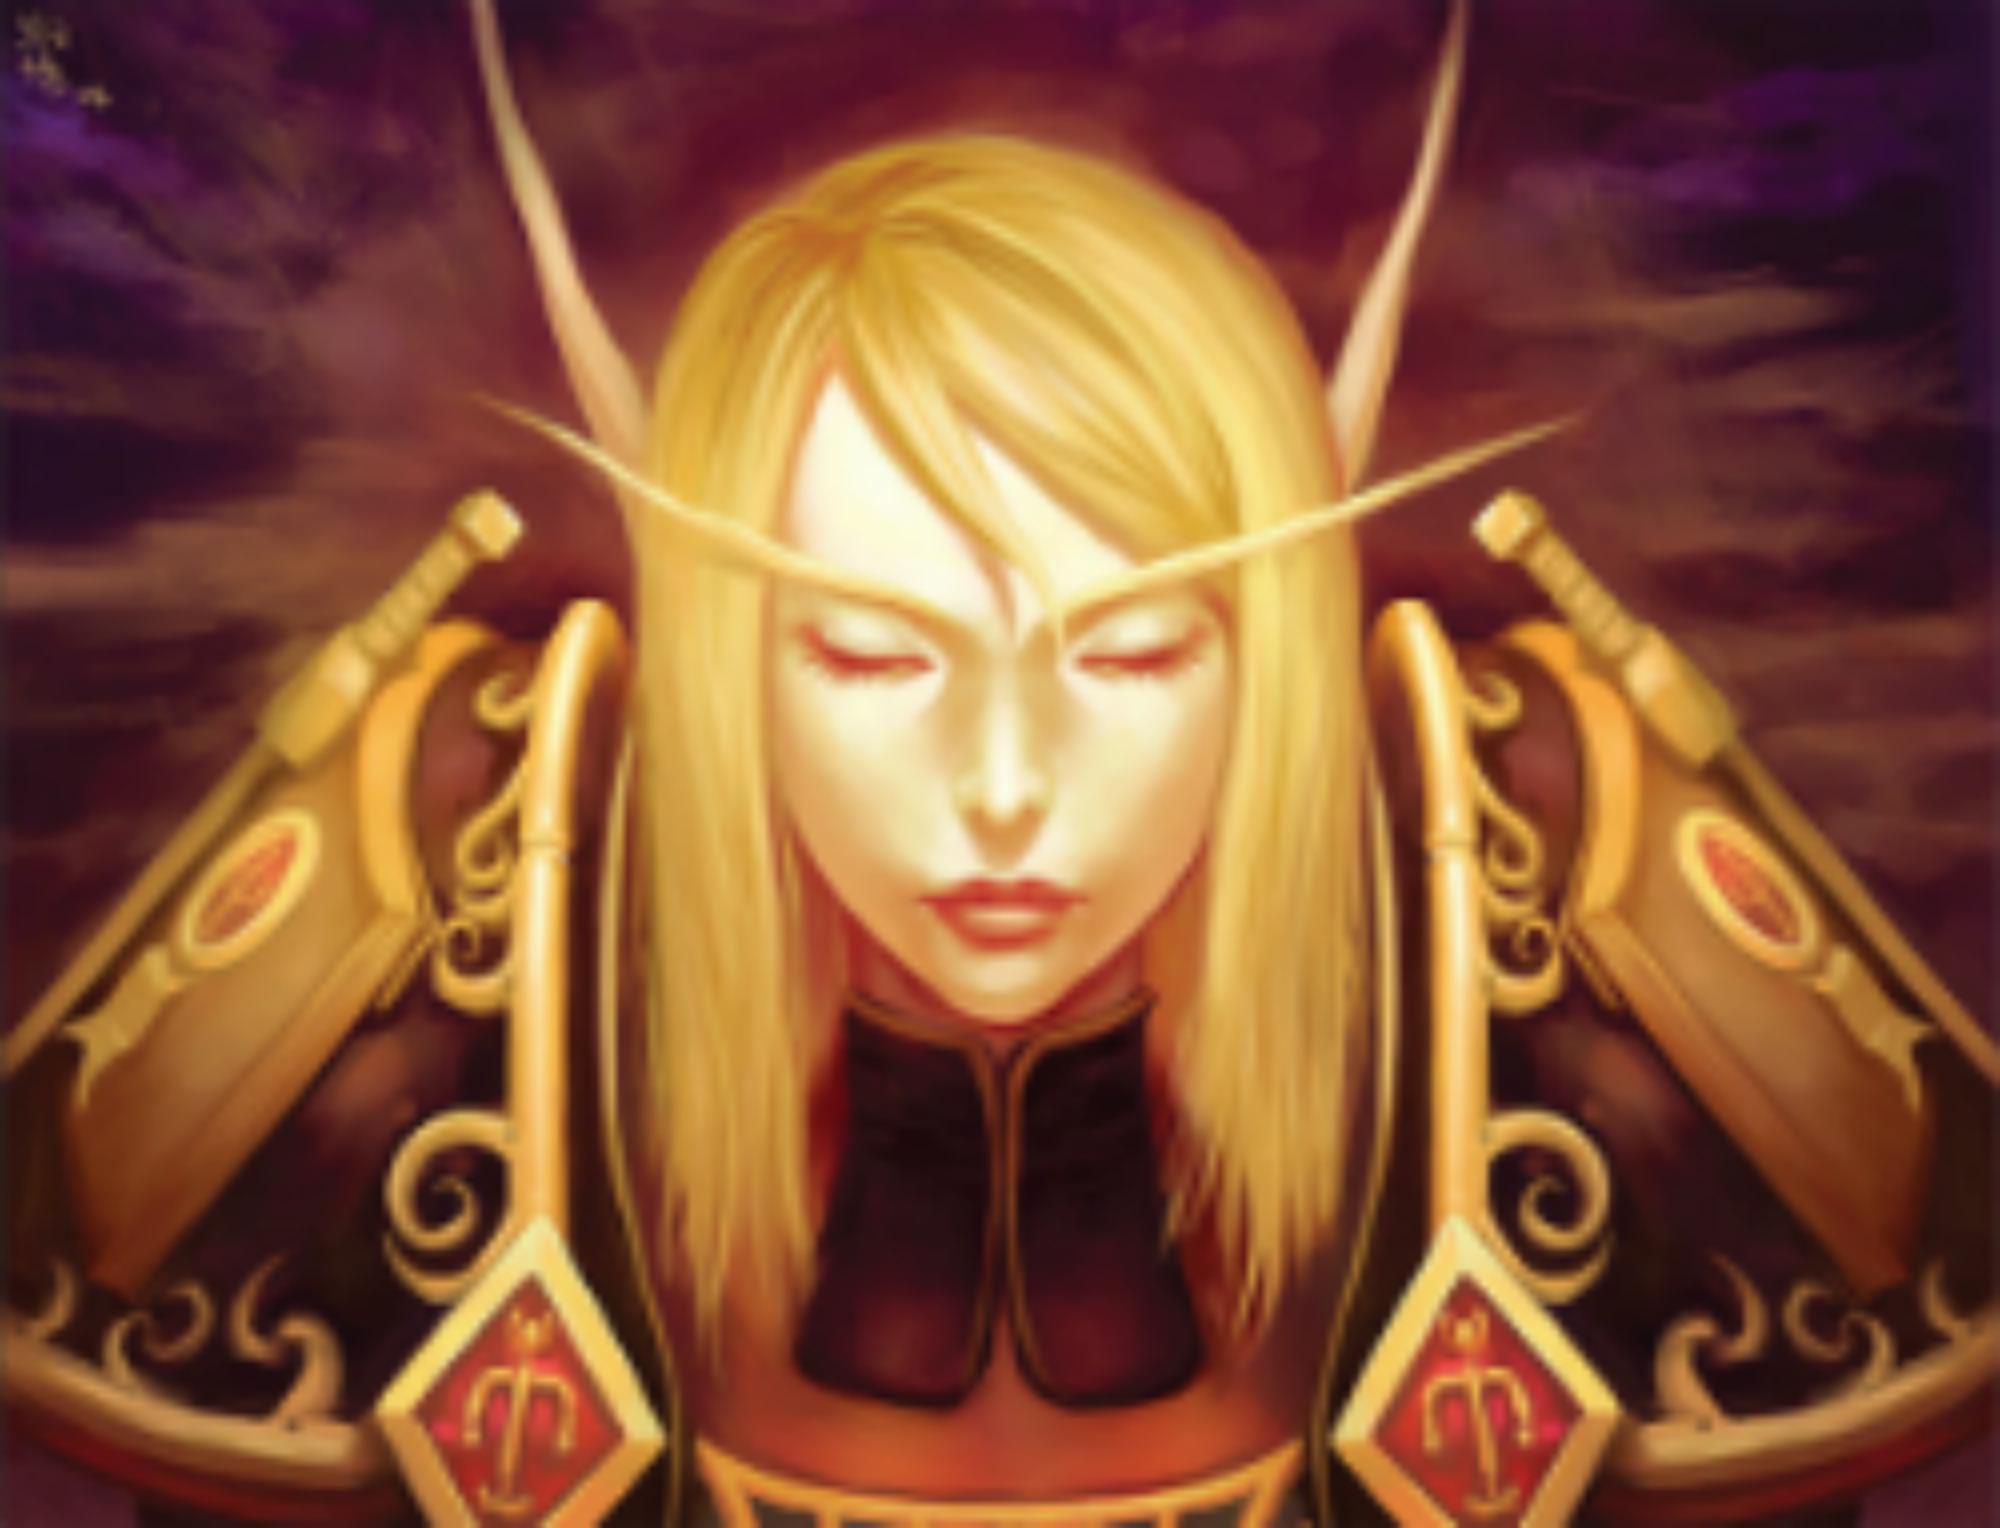 World of warcraft blood elf and human  nsfw photos